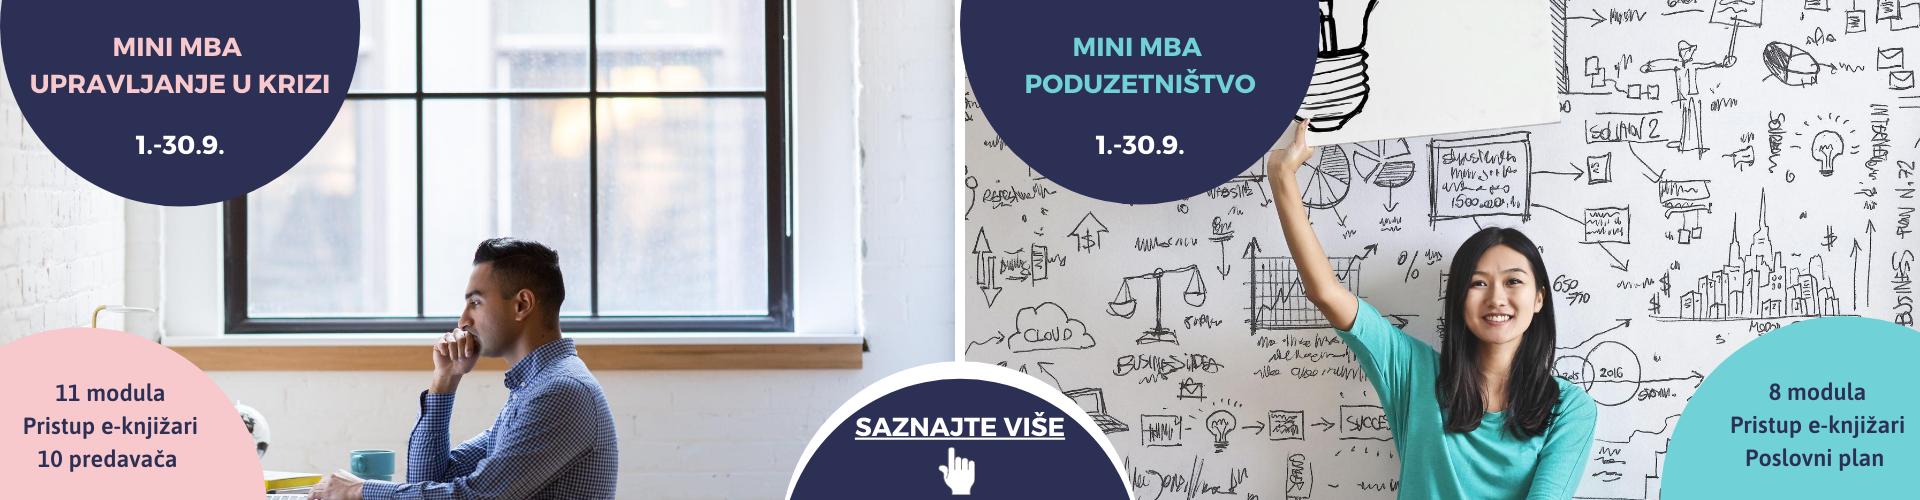 Mini MBA 2